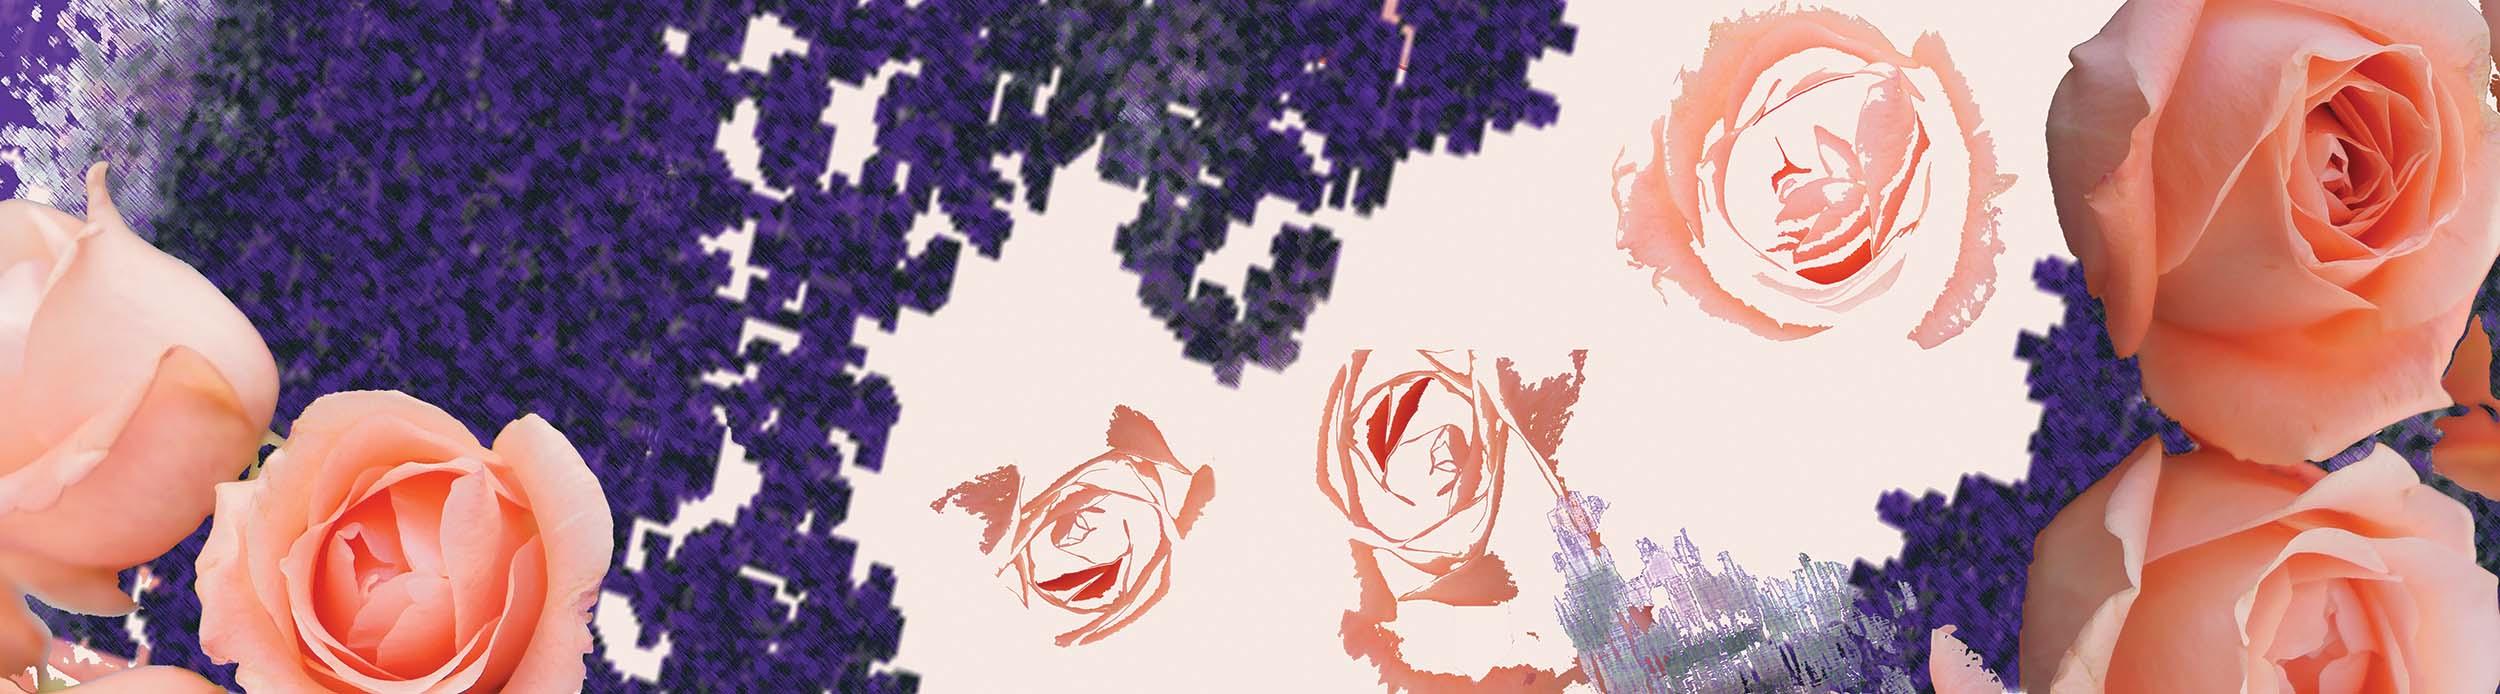 SpringRose.peach.lavender.Website Banner.jpg